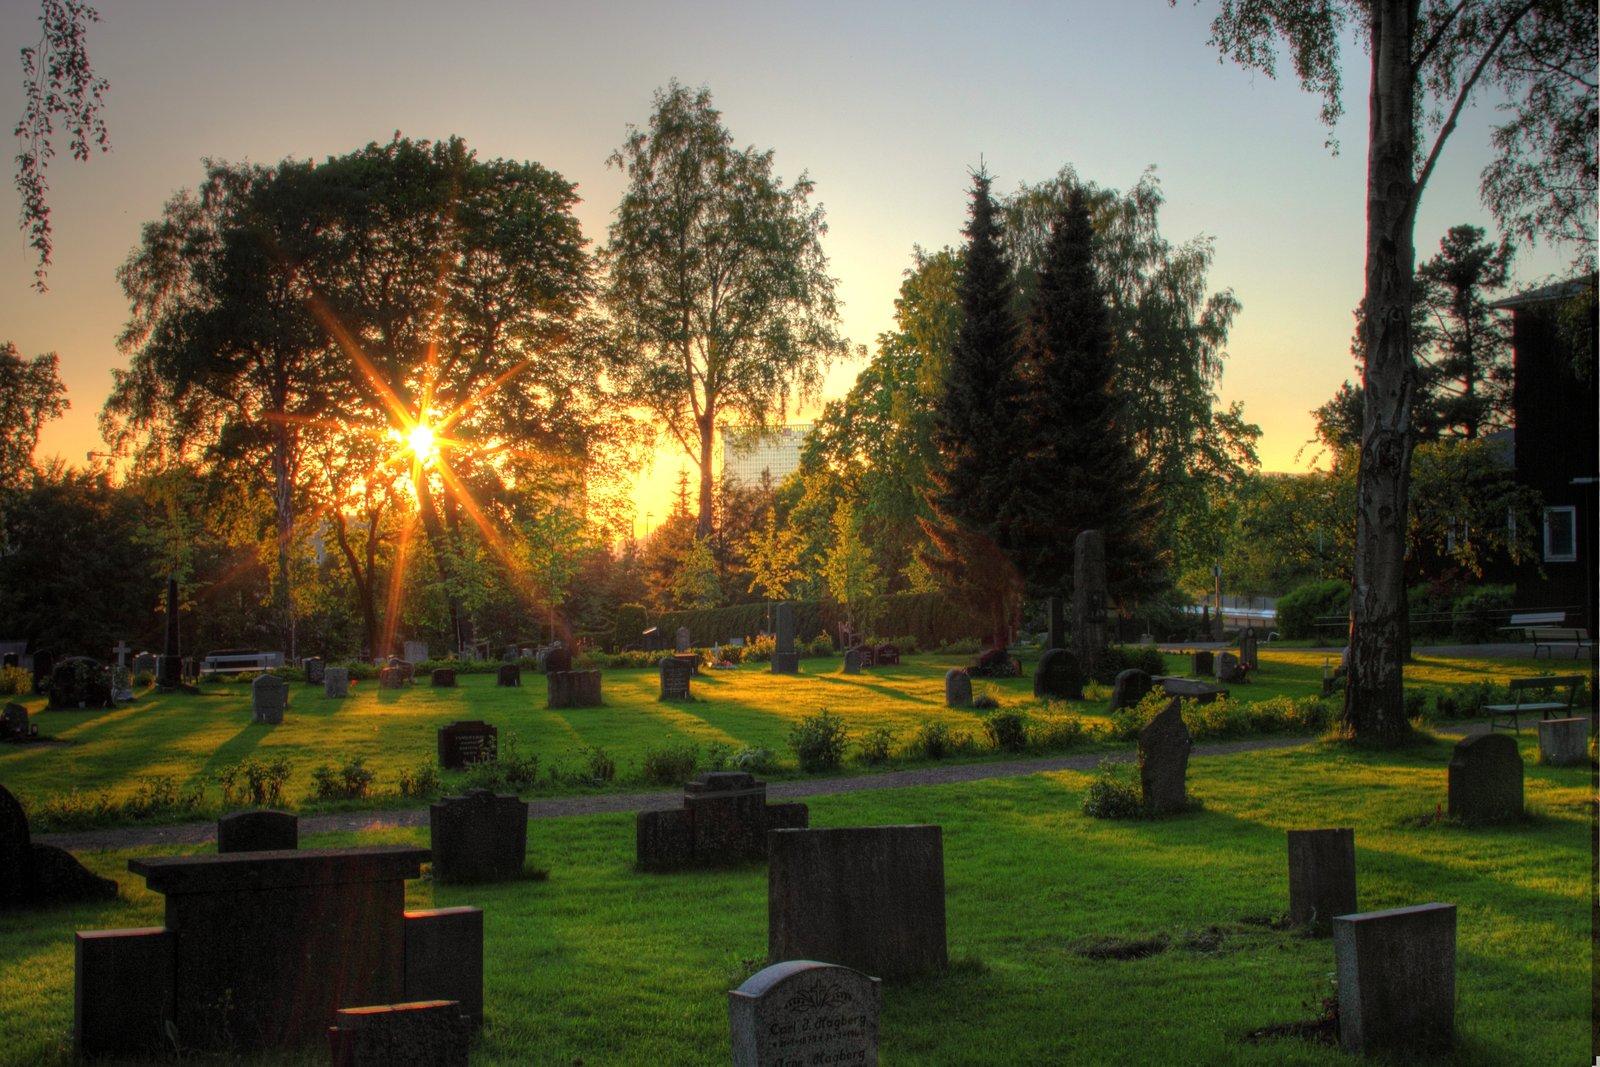 Cemetery_in_sunset_2_by_mariusjellum.jpg